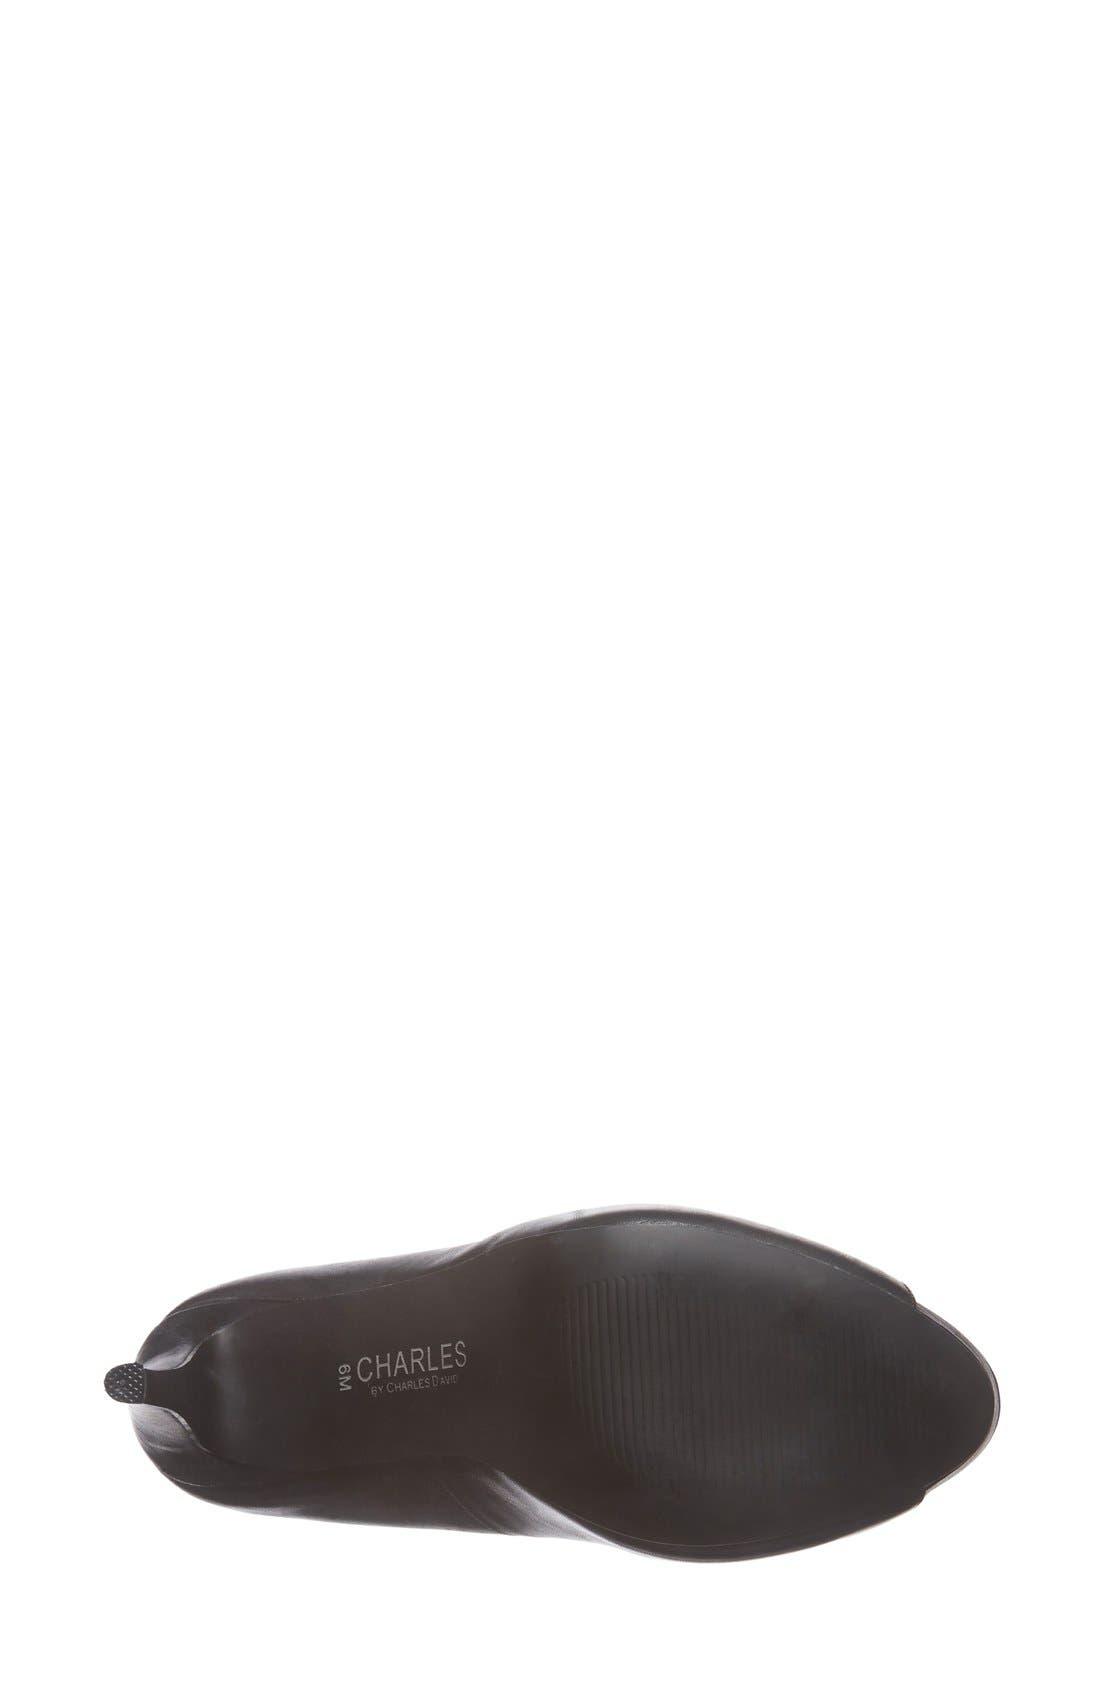 'Fox' Platform Peep Toe Pump,                             Alternate thumbnail 4, color,                             001